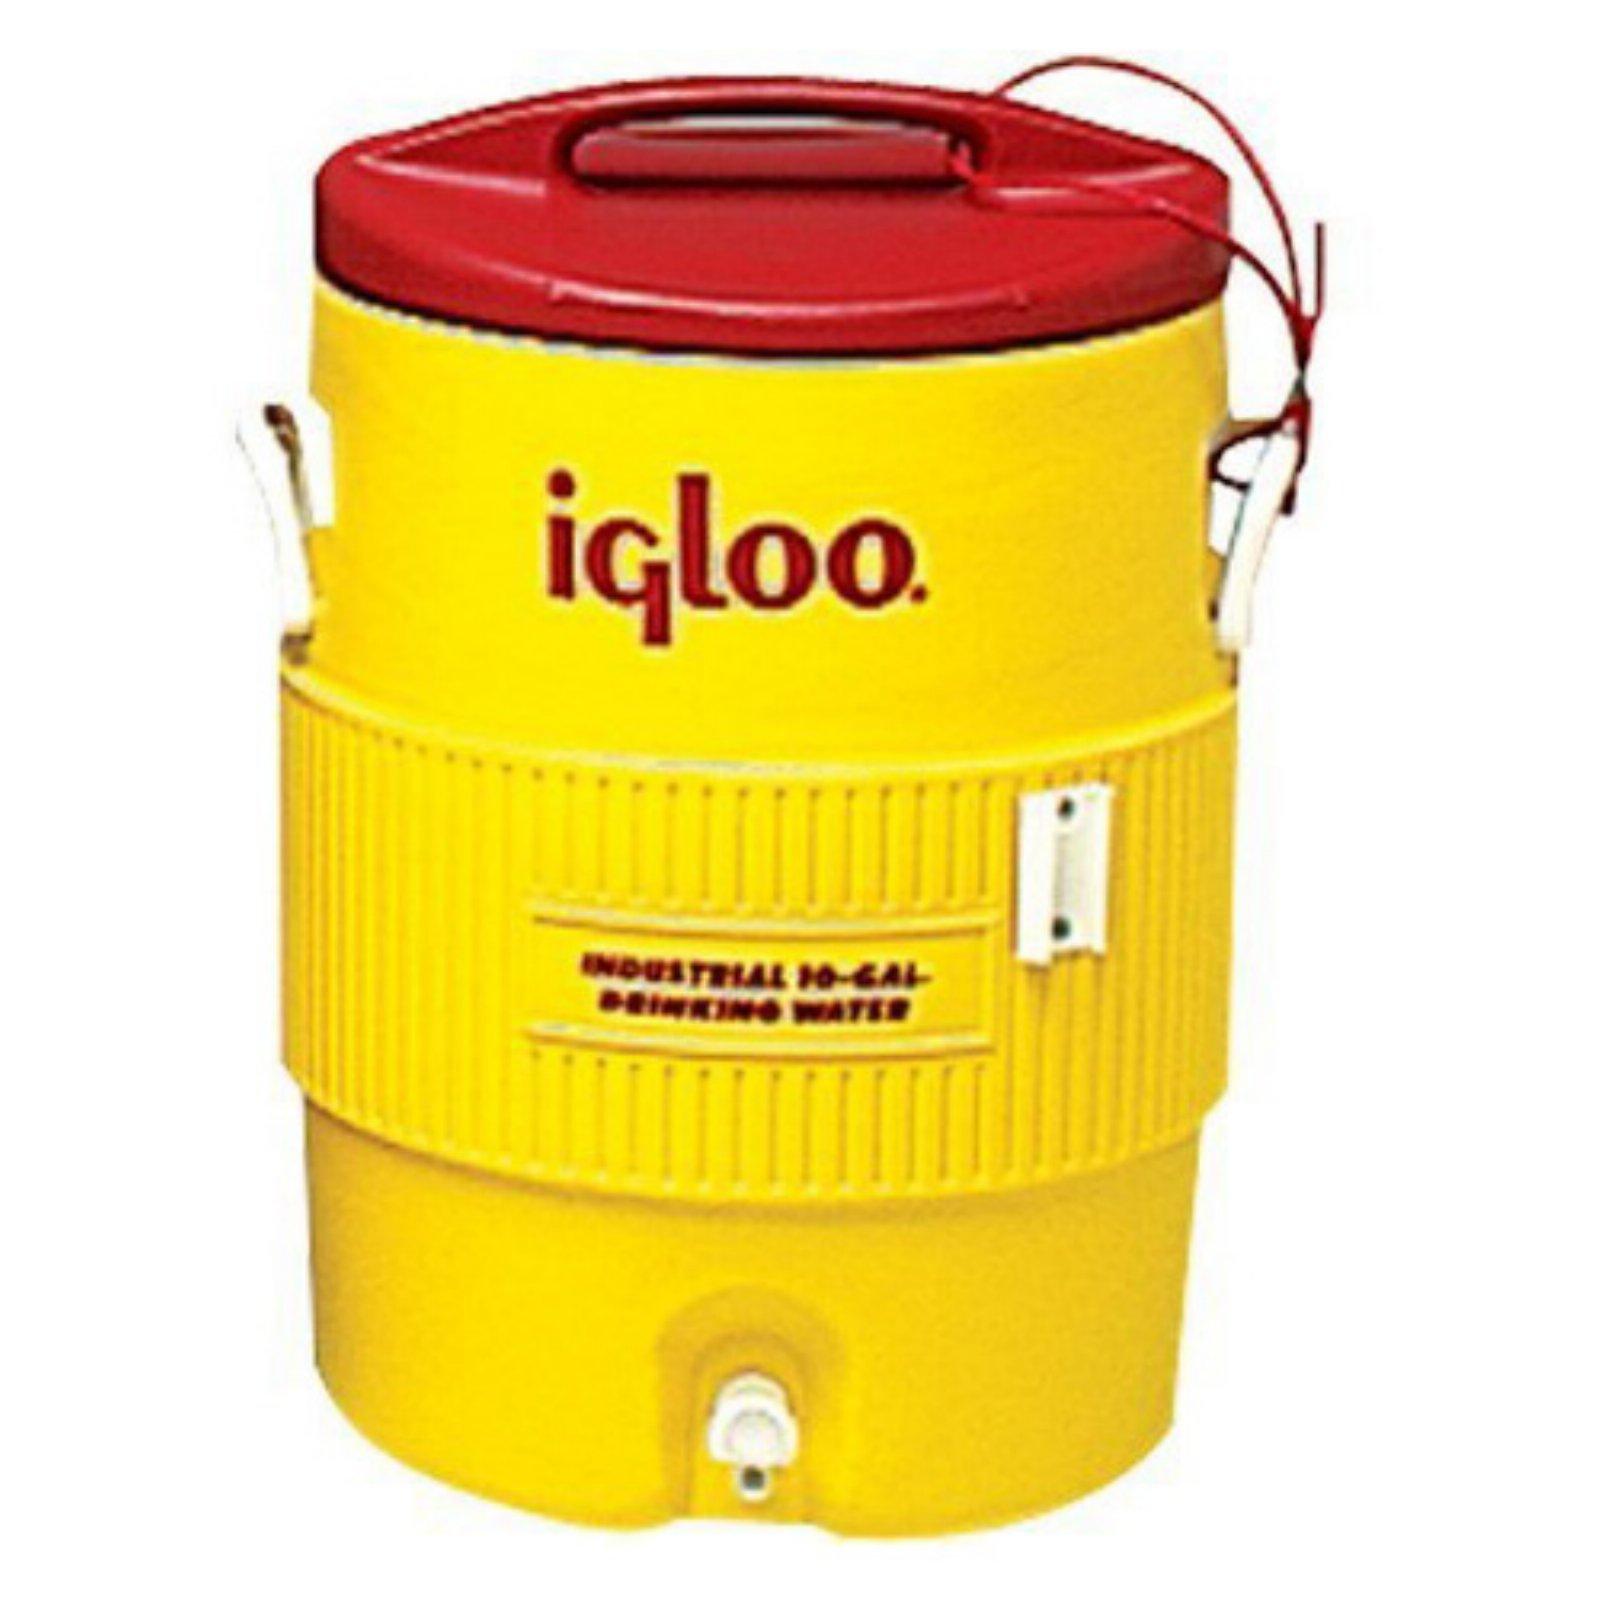 Igloo 10-Gallon Cooler, Yellow